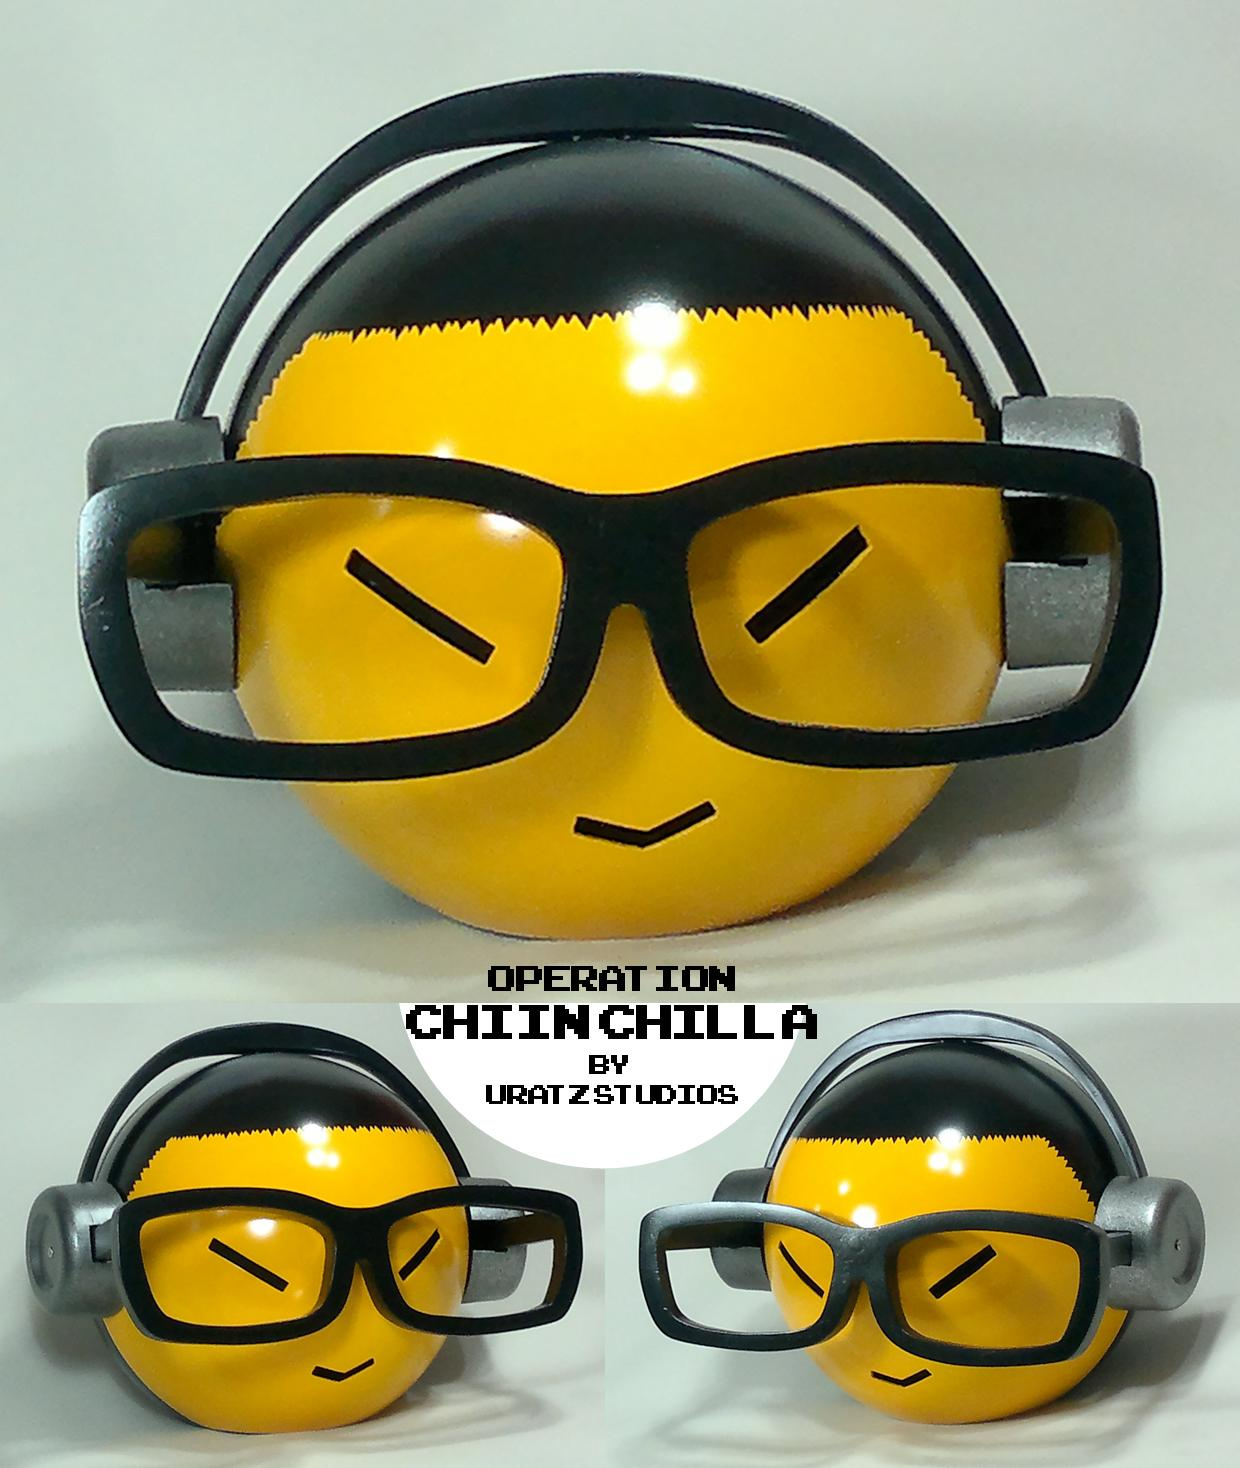 Chiin chilla helmet by uratz studios on deviantart - Uratz studios ...